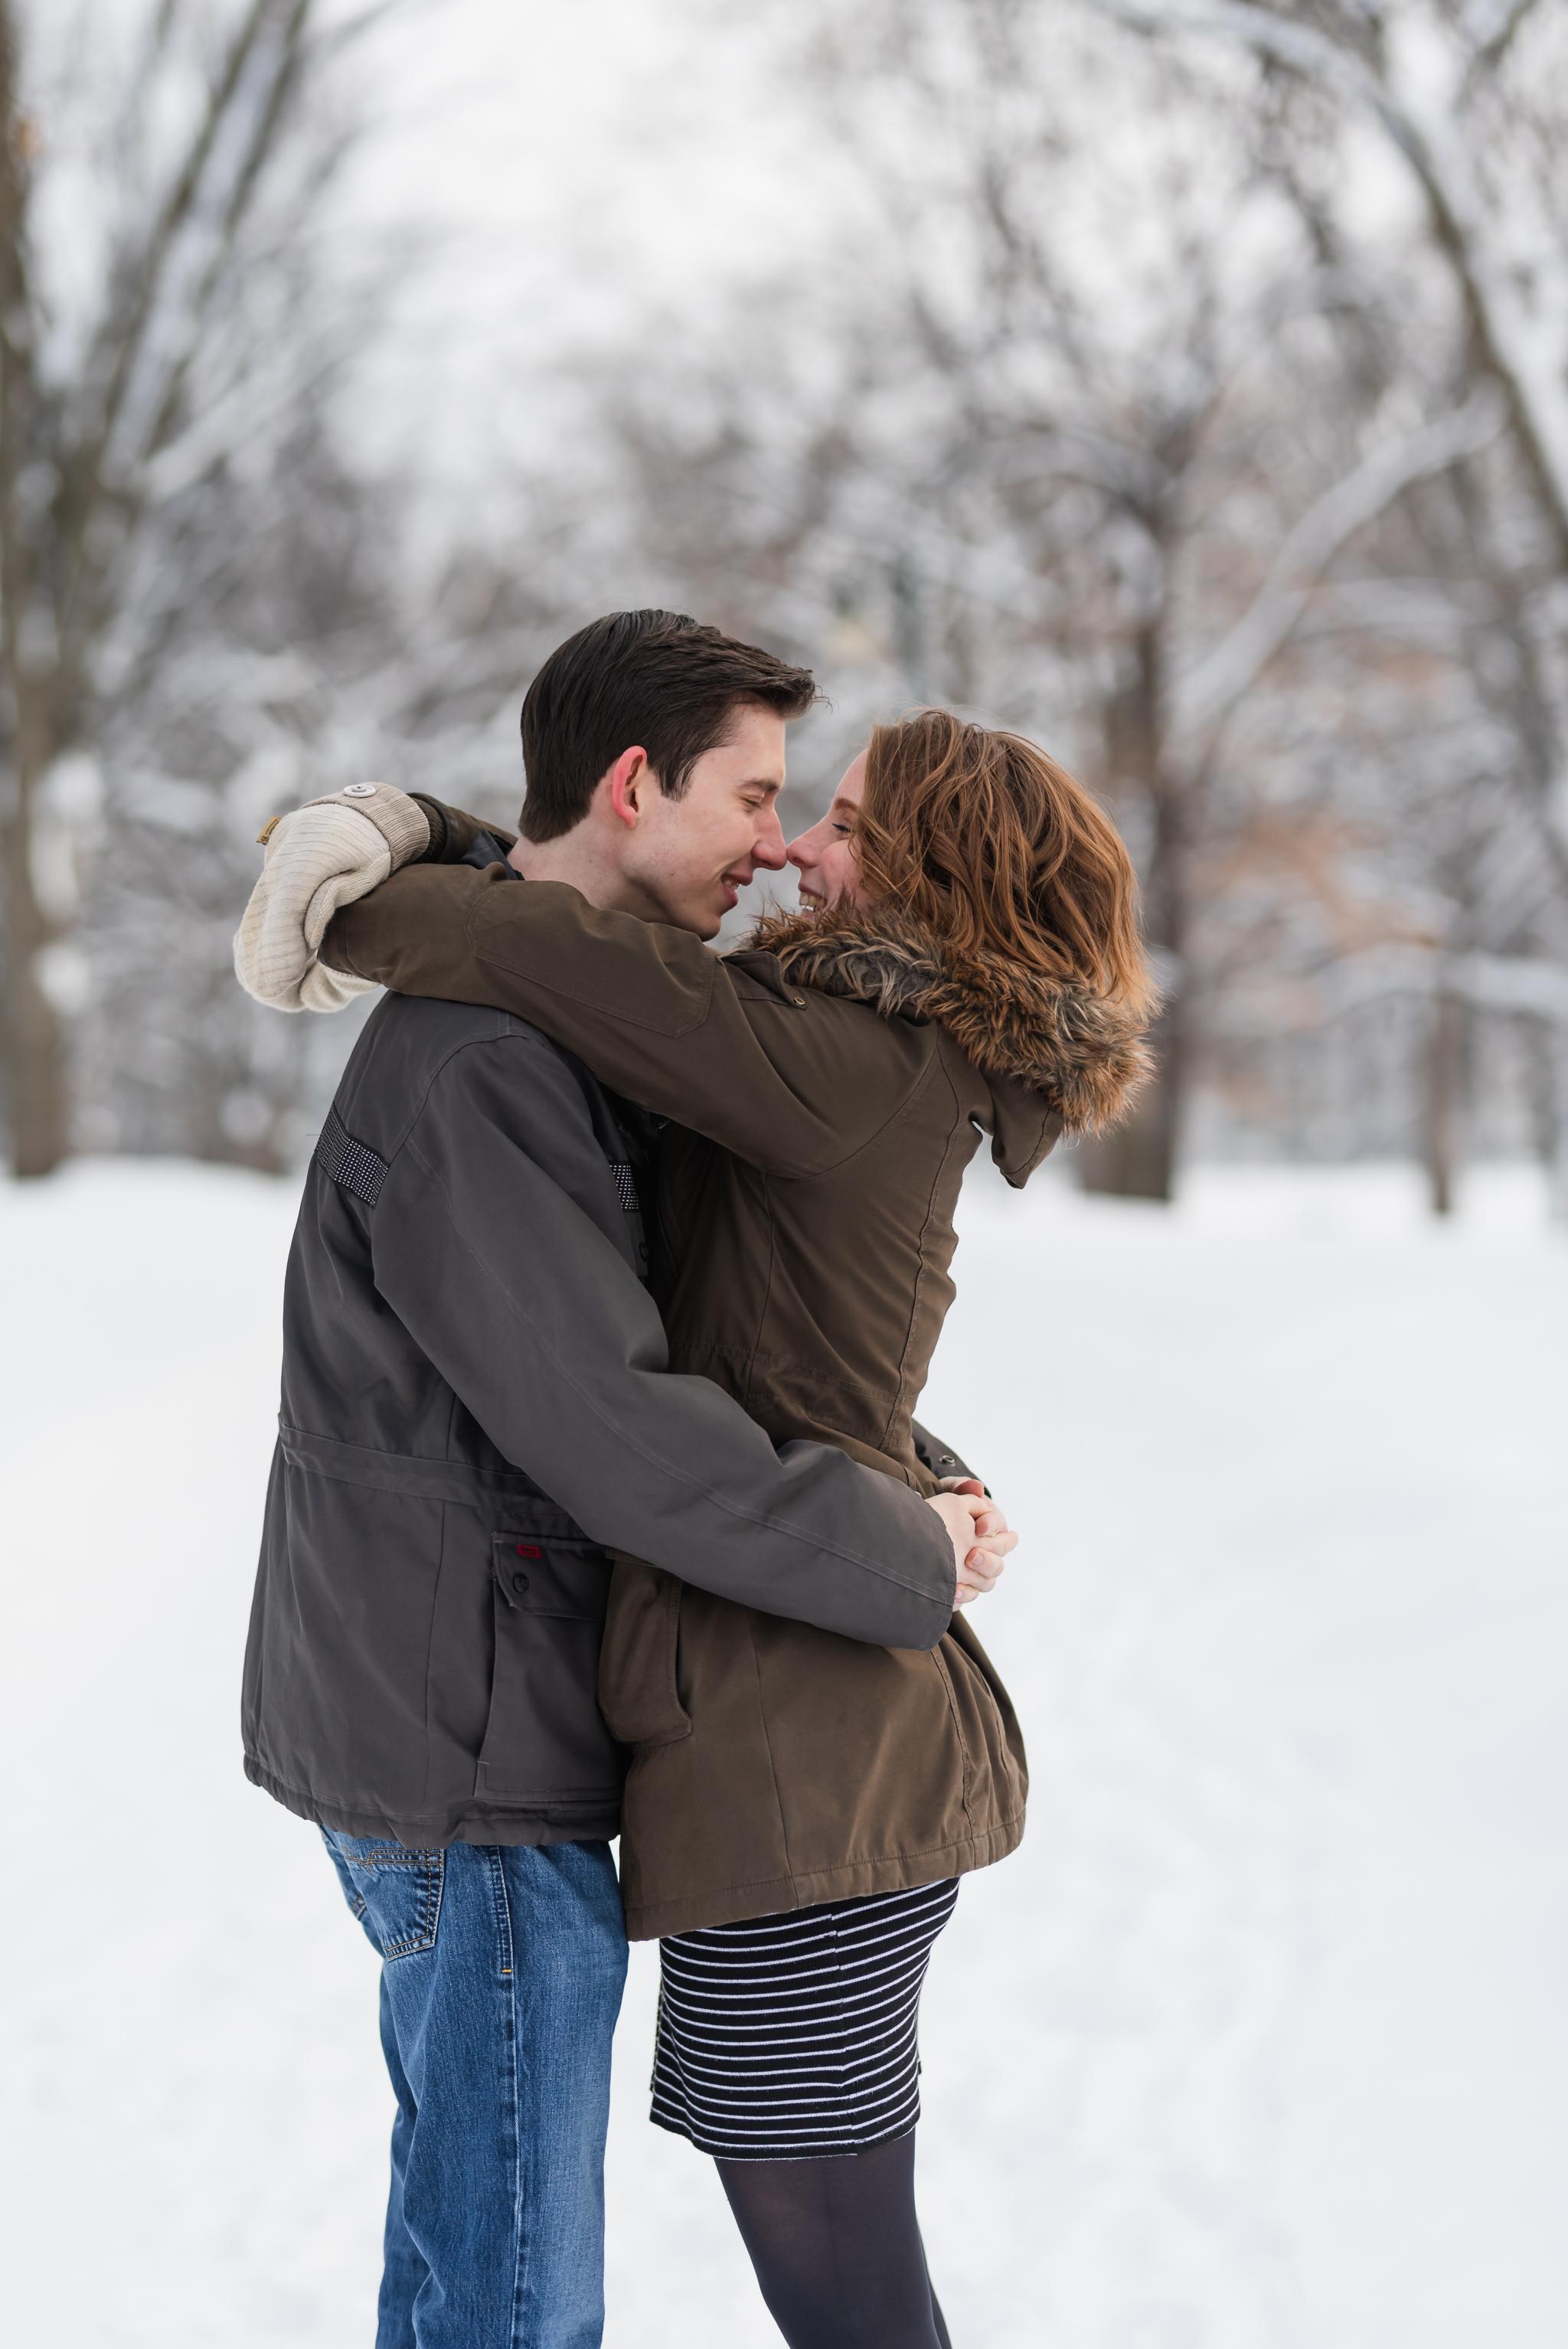 Winter Fargo Island Park Engagement Photos - Chelsea Joy Photography